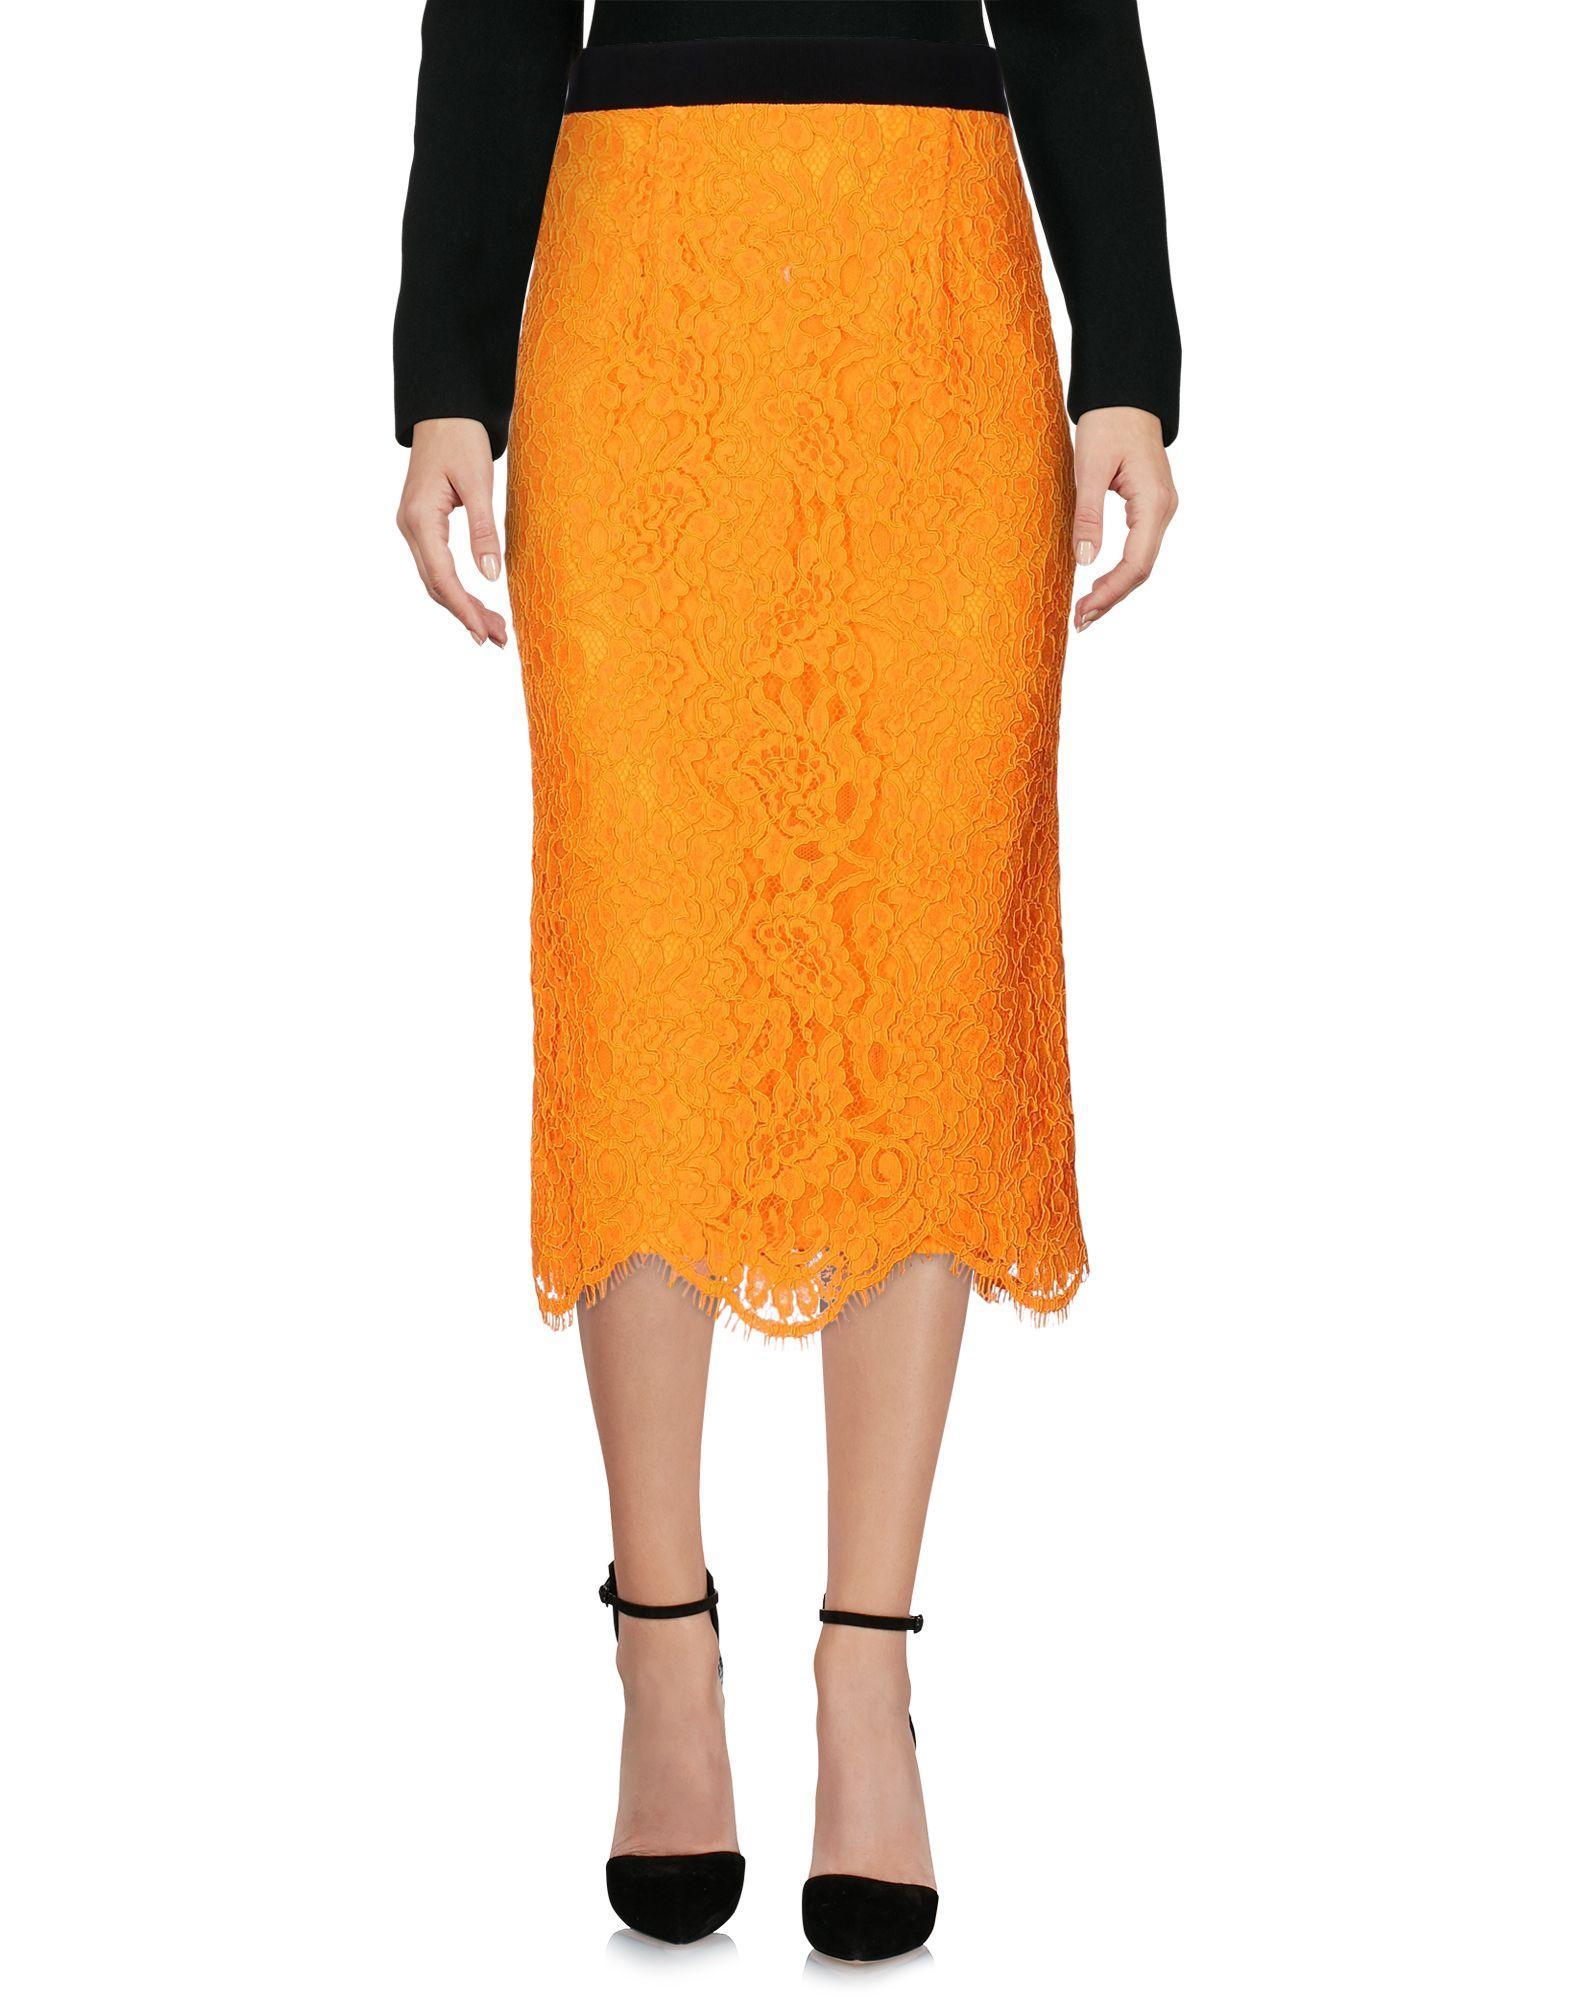 Marco Bologna Midi Skirts In Orange